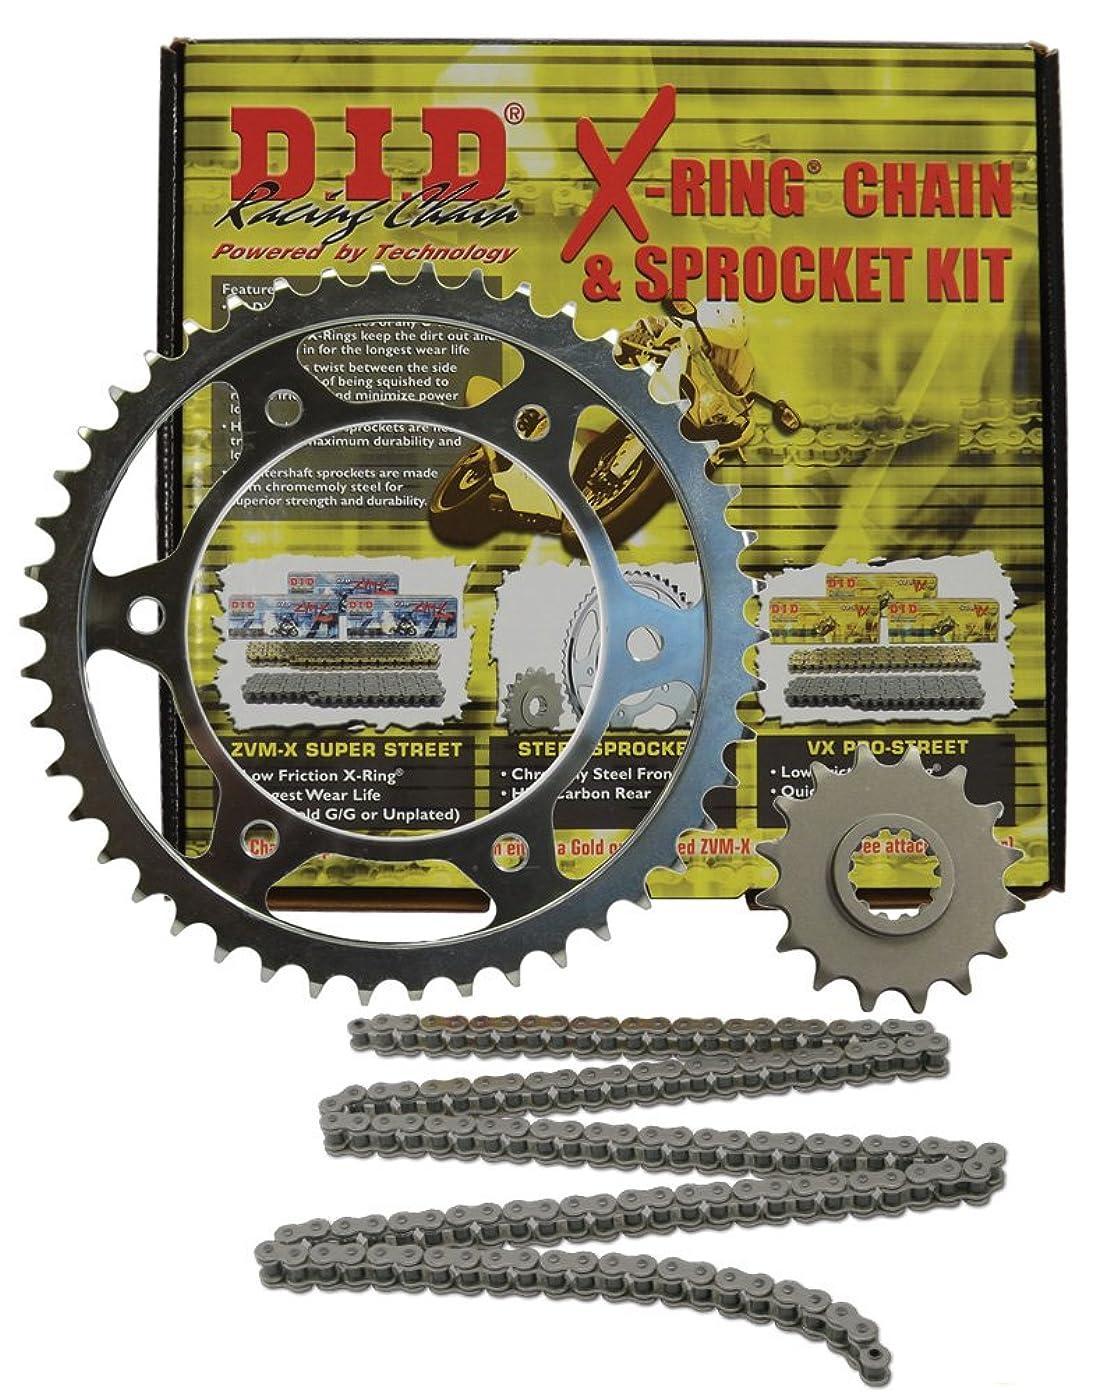 D.I.D. (DKK-003 520VX2 Chain and 15/40T Sprocket Kit